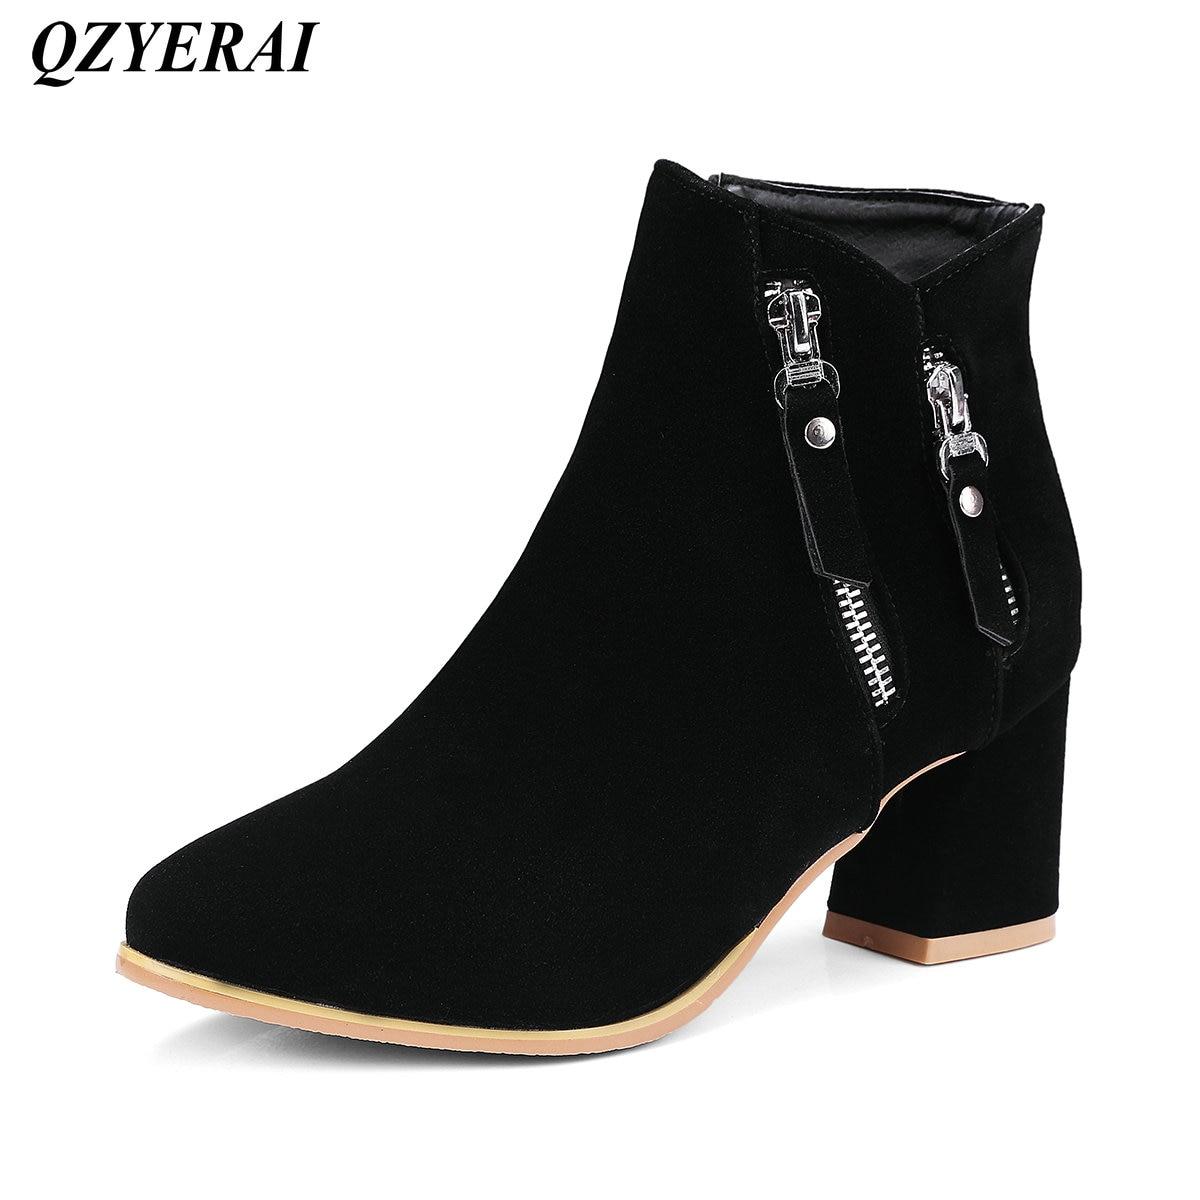 QZYERAI Qiu dong lady fashion short boots super heel female boots fashionable font b womens b